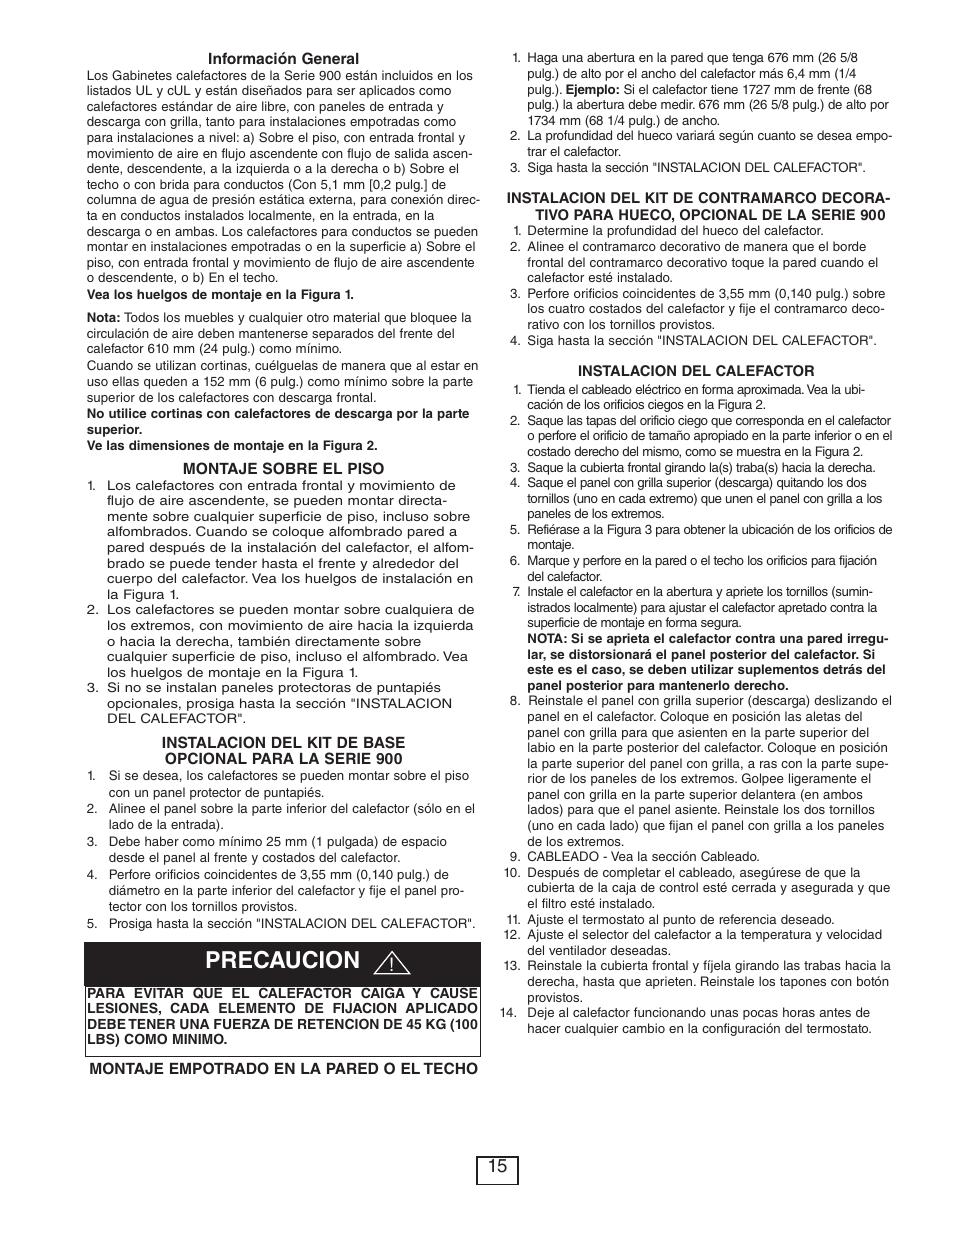 Precaucion | Qmark CUS900 - Stock Cabinet Unit Heater User Manual ...